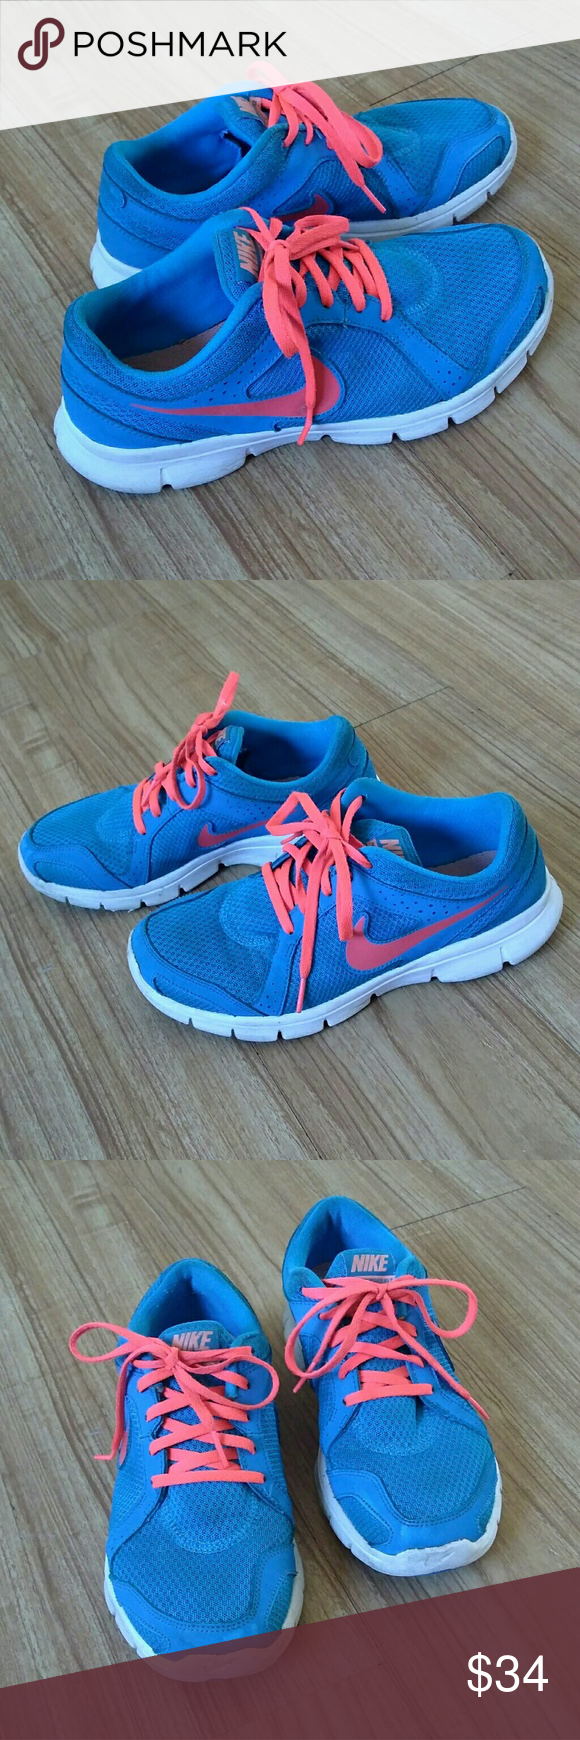 nike water shoes nike running weights